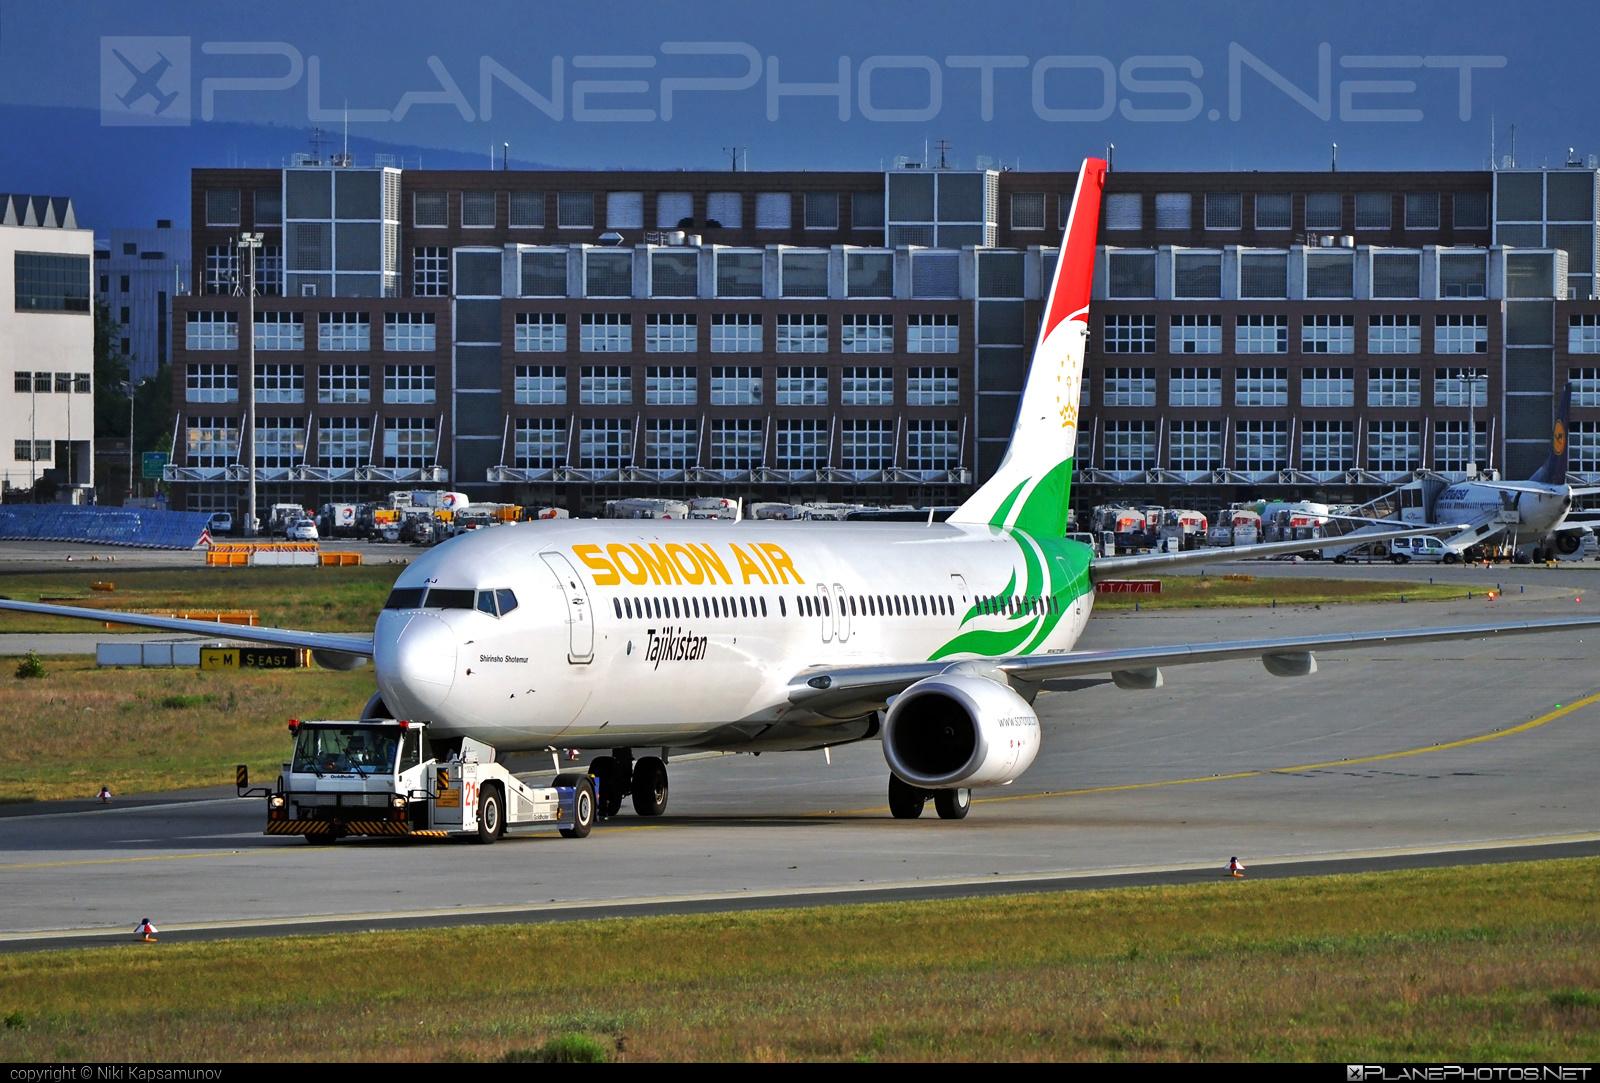 Boeing 737-900ER - P4-TAJ operated by Somon Air #b737 #b737er #b737nextgen #b737ng #boeing #boeing737